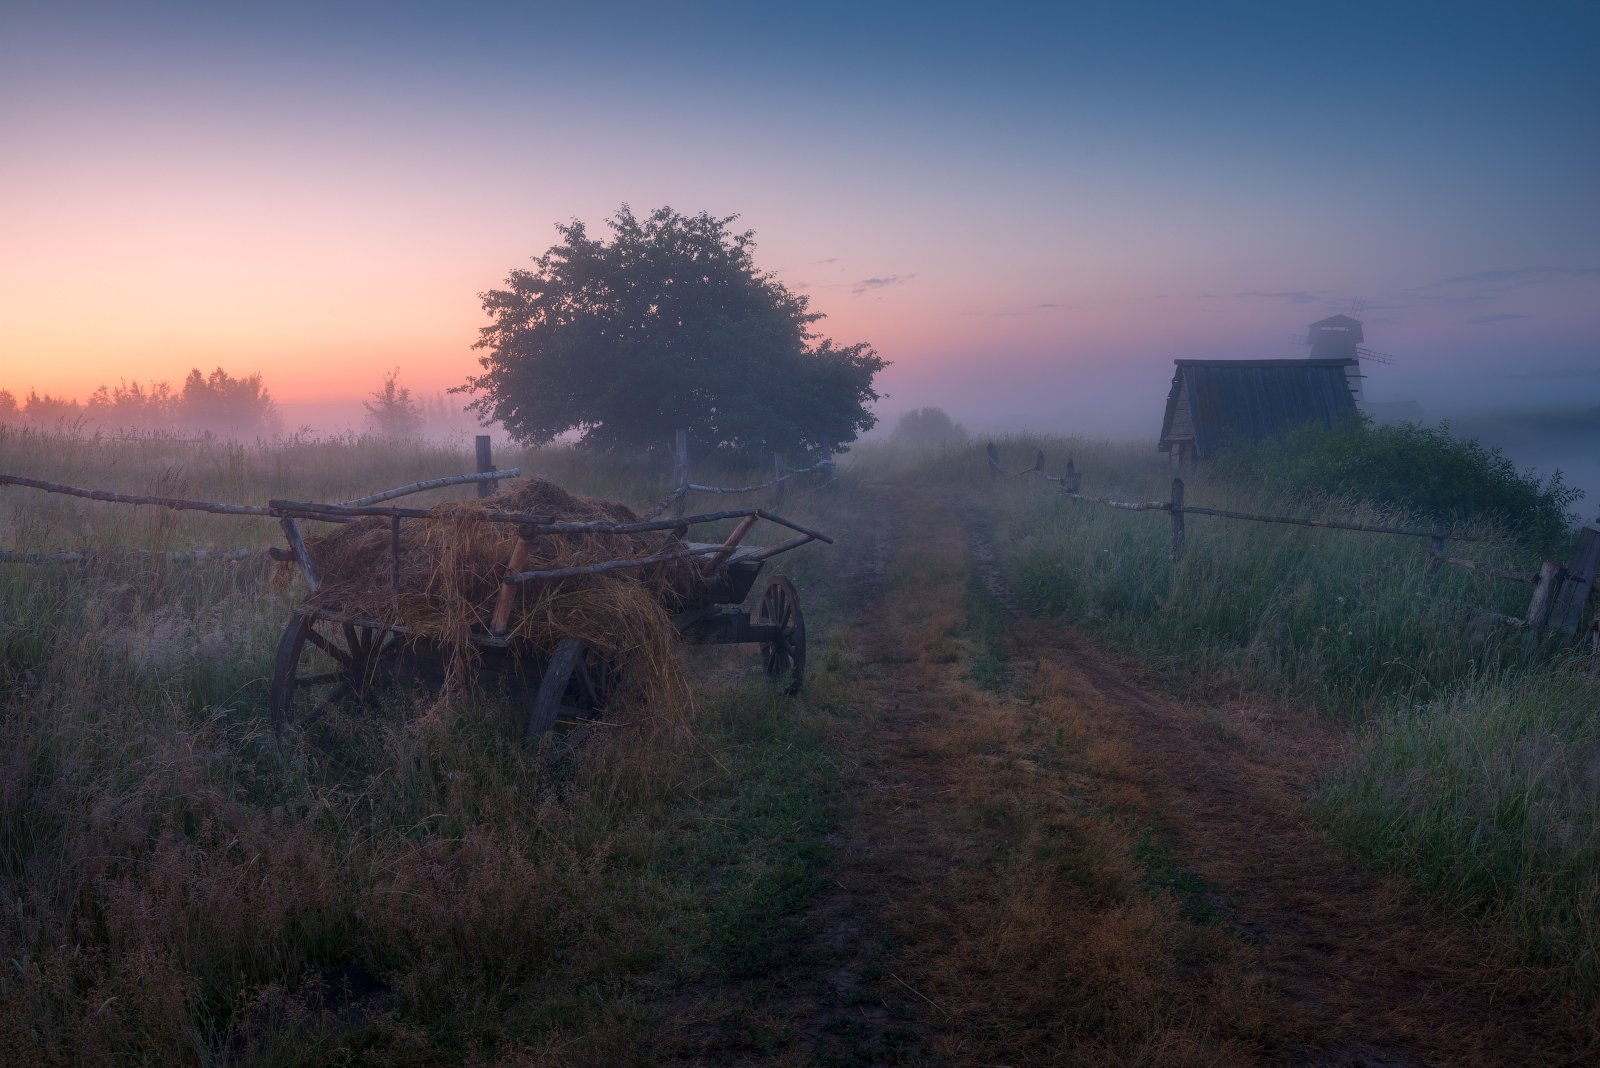 туман, утро, деревня, телега, дорога, рассвет, Cтанислав Малых